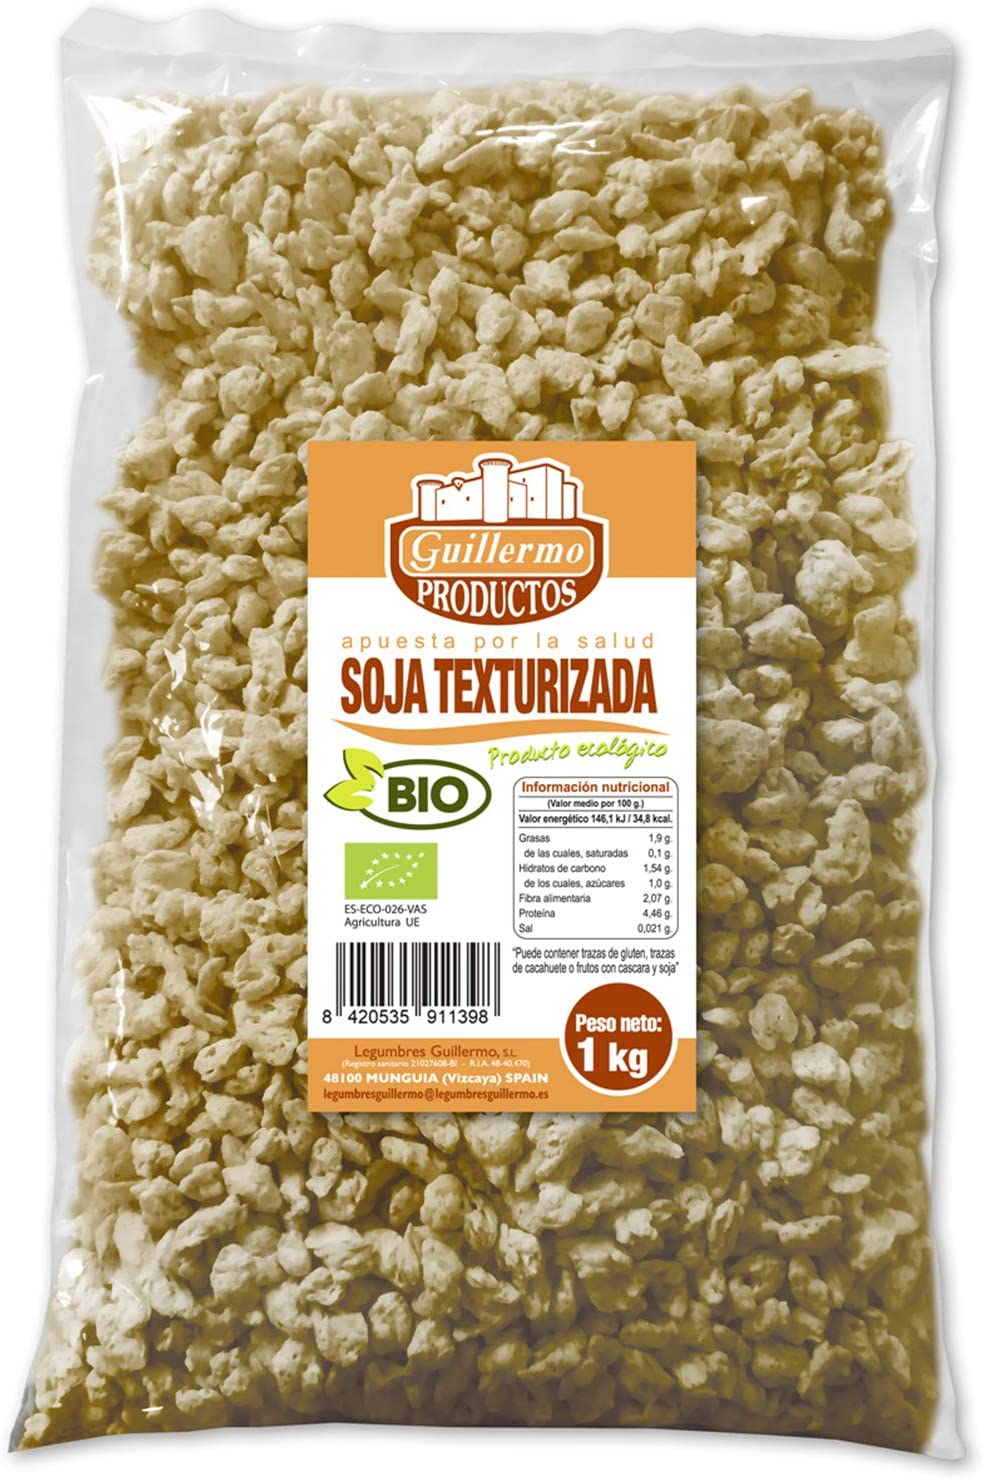 Guillermo Soja Texturizada Ecológica BIO Superalimento 100 ...